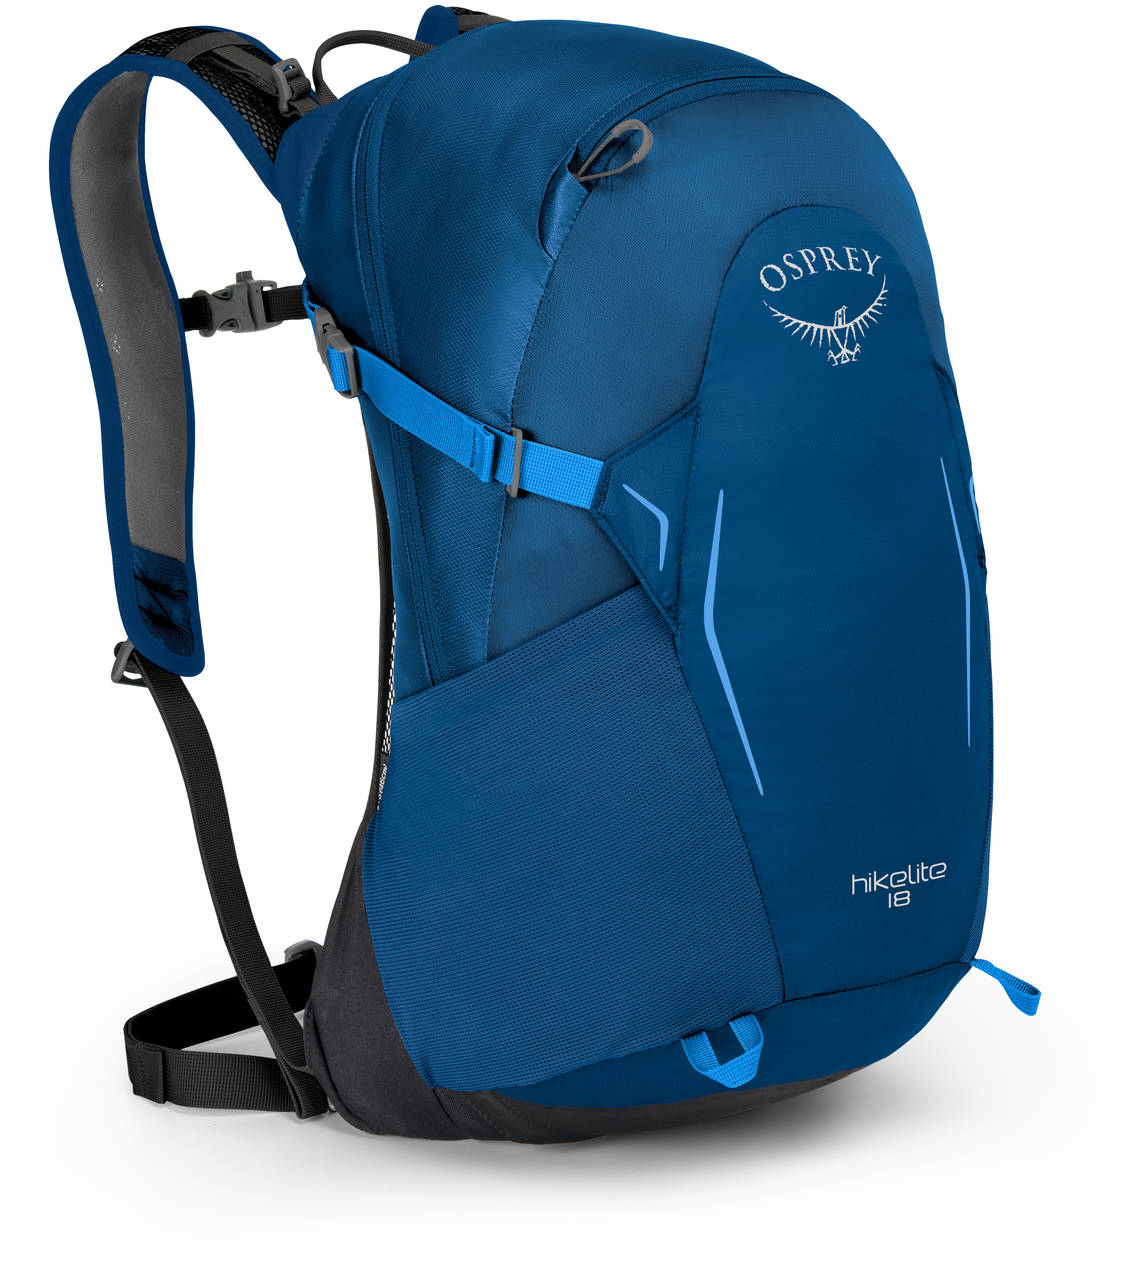 Туристические рюкзаки Рюкзак Osprey Hikelite 18 Bacca Blue HIkelite18_S18_Side_BaccaBlue_web.jpg